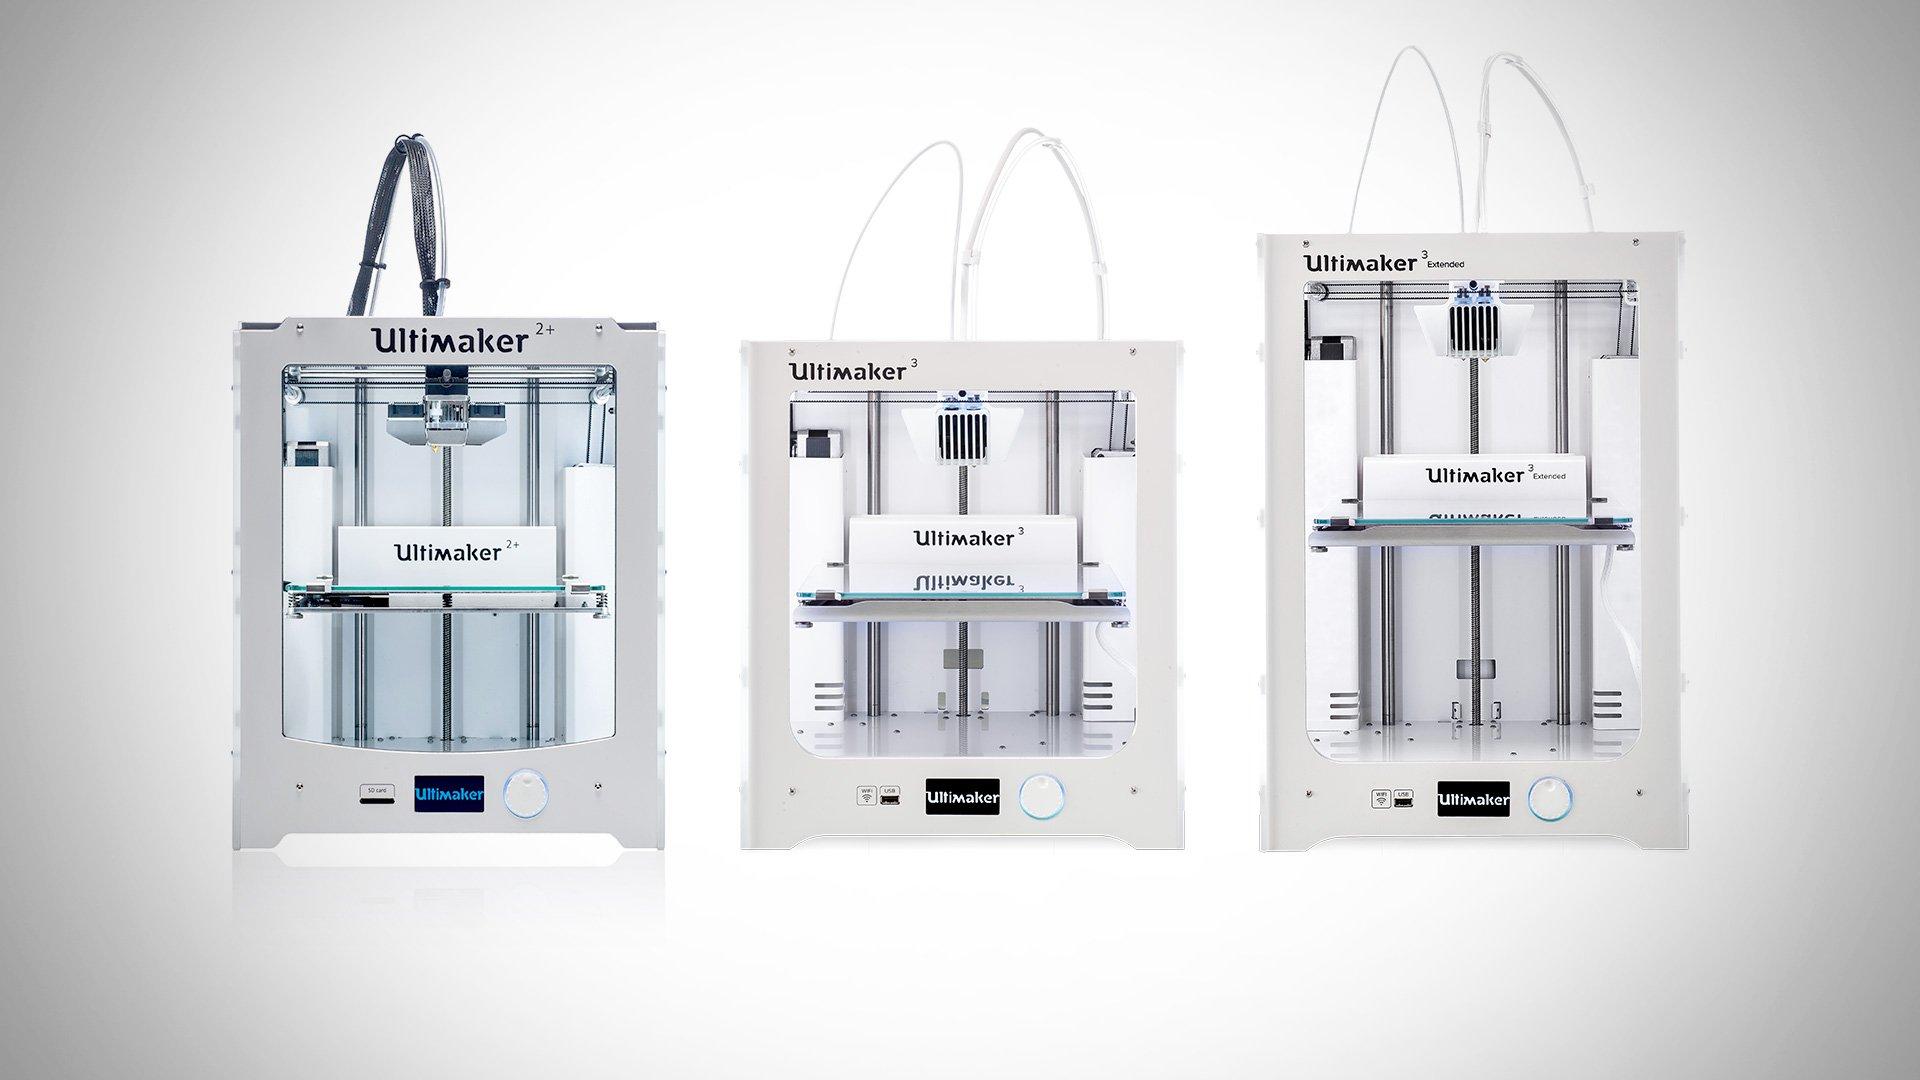 [DEAL] Ultimaker 3D Printers (Refurbished), 10-15% Off at MatterHackers | All3DP